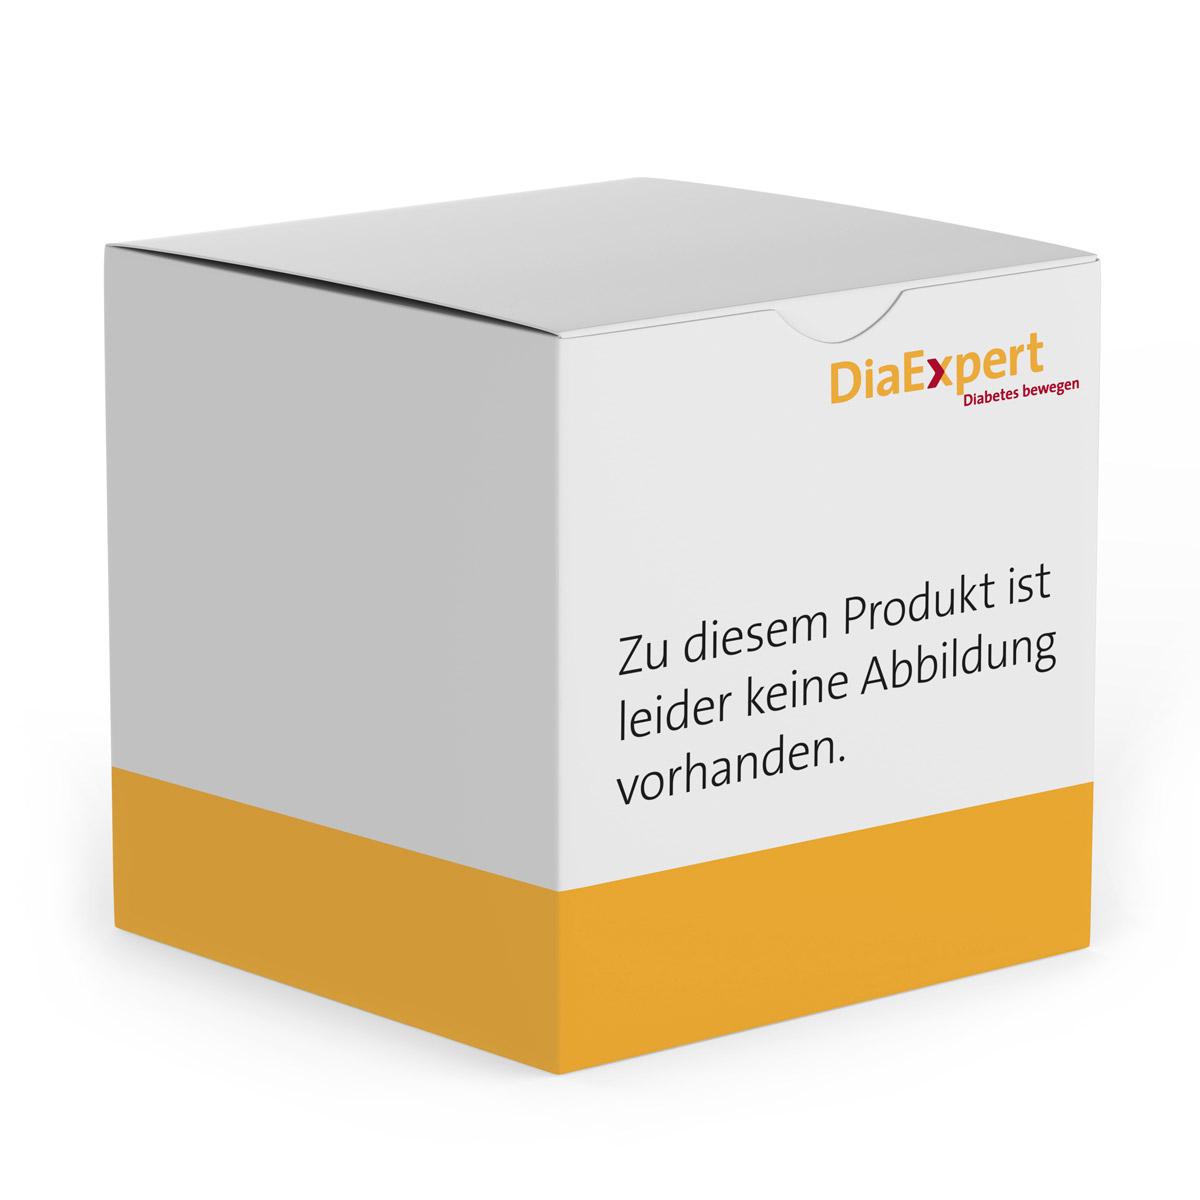 Accu-Chek Combo mg/dL